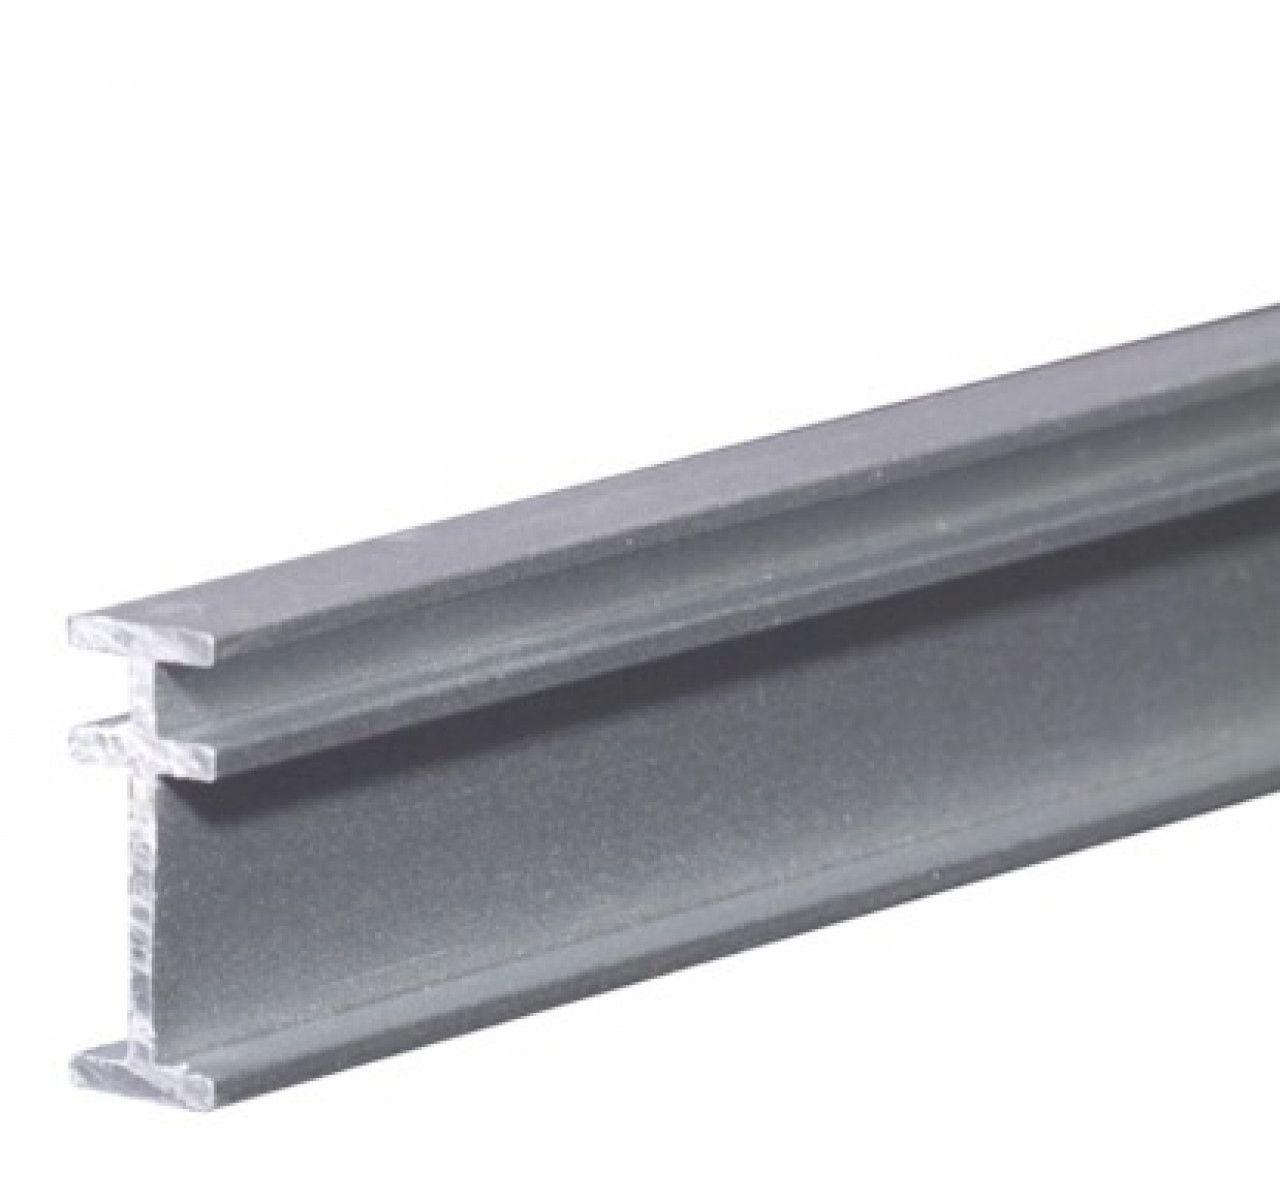 Recmar 4108 Bendable I Beam Curtain Track 8 Feet Curtain Track Ceiling Mounted Curtain Track Shower Curtain Track